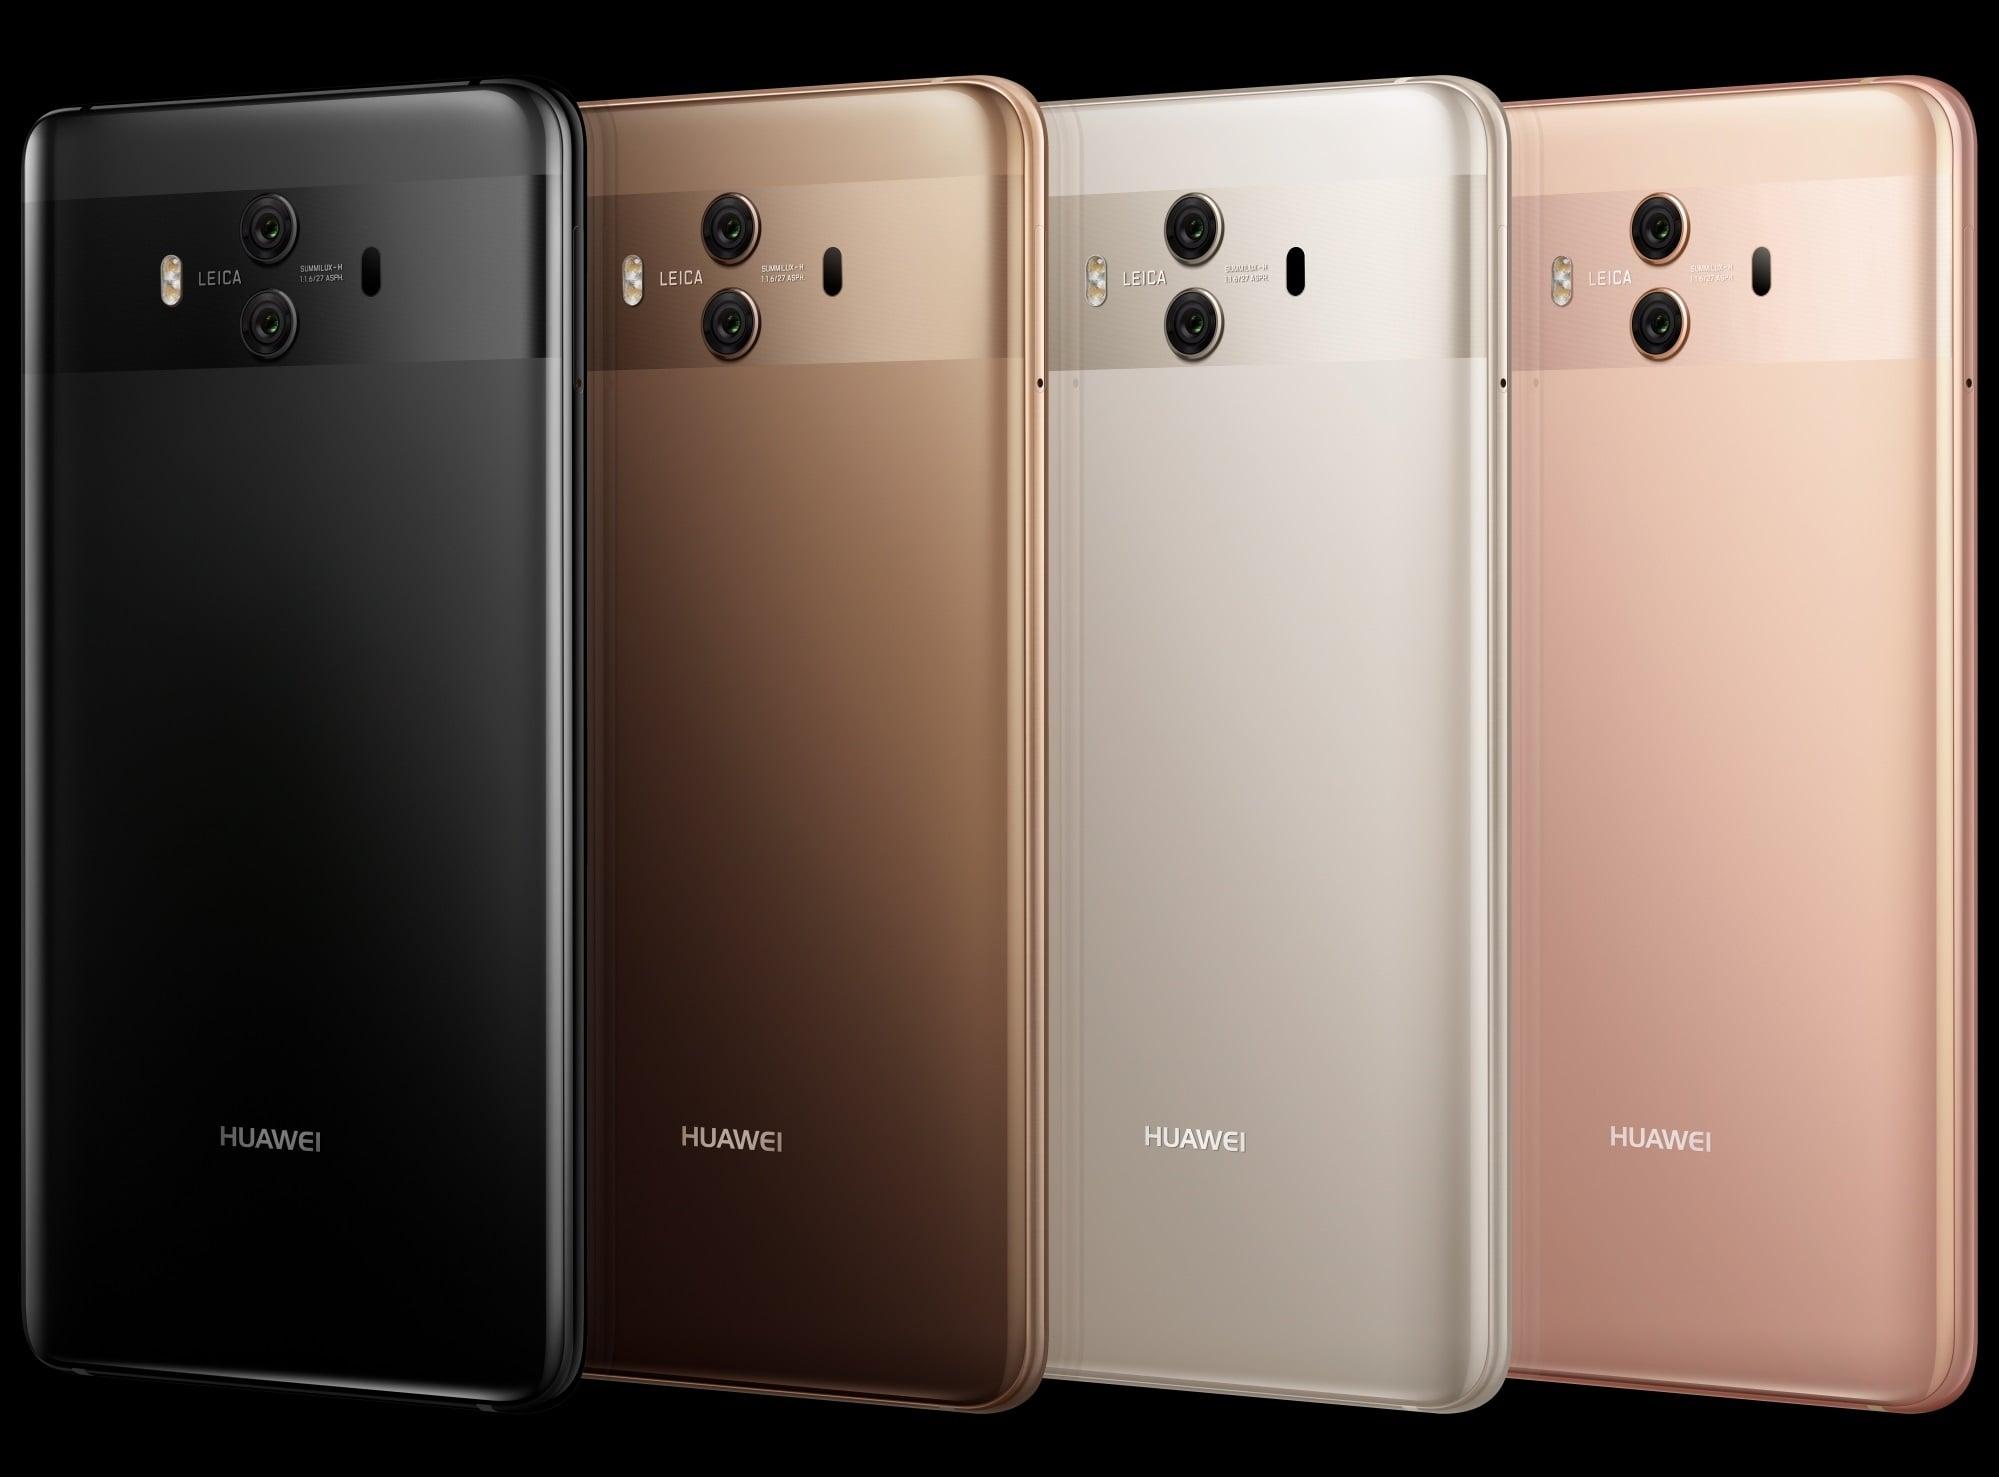 Tabletowo.pl Huawei Mate 10 vs Huawei Mate 9 - porównanie parametrów Android Huawei Porównania Smartfony